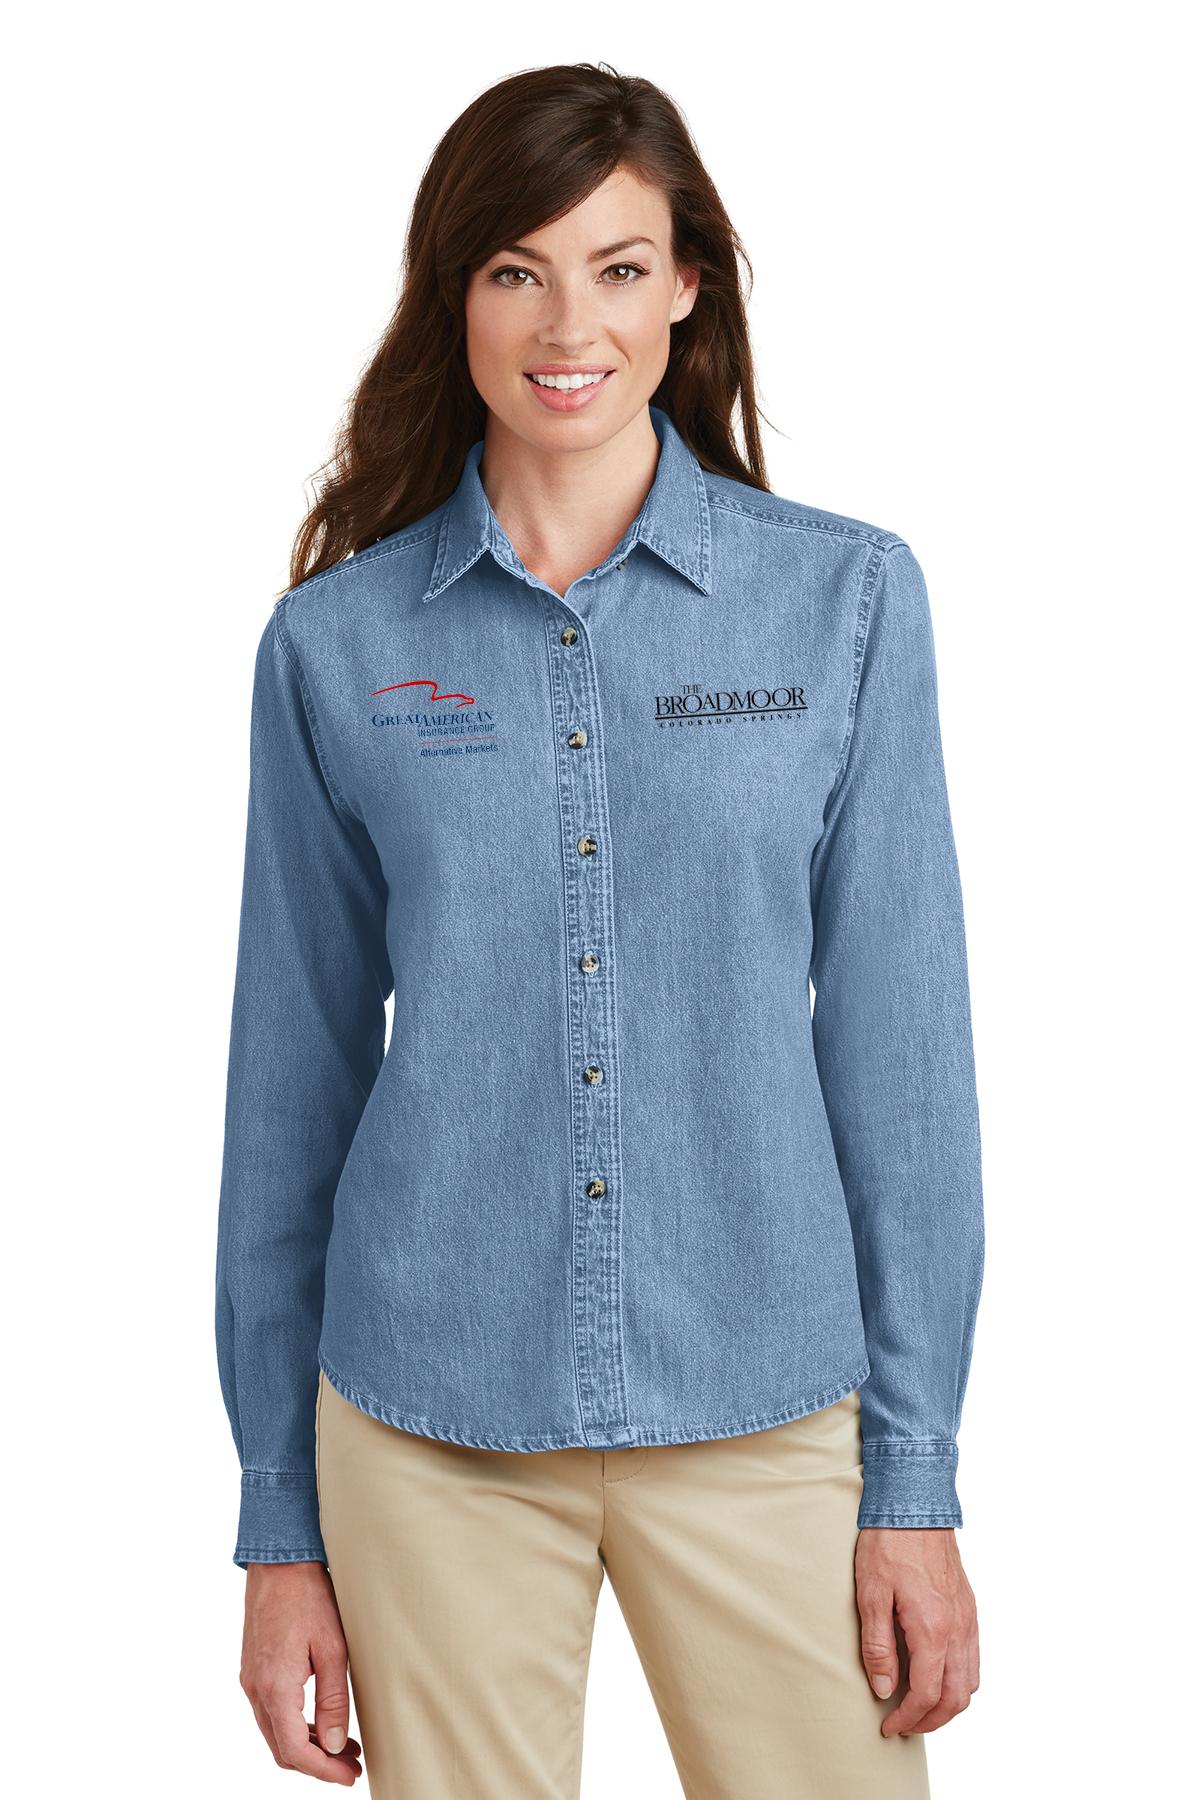 custom design of Port Authority® L600D Ladies Long Sleeve Denim Shirt